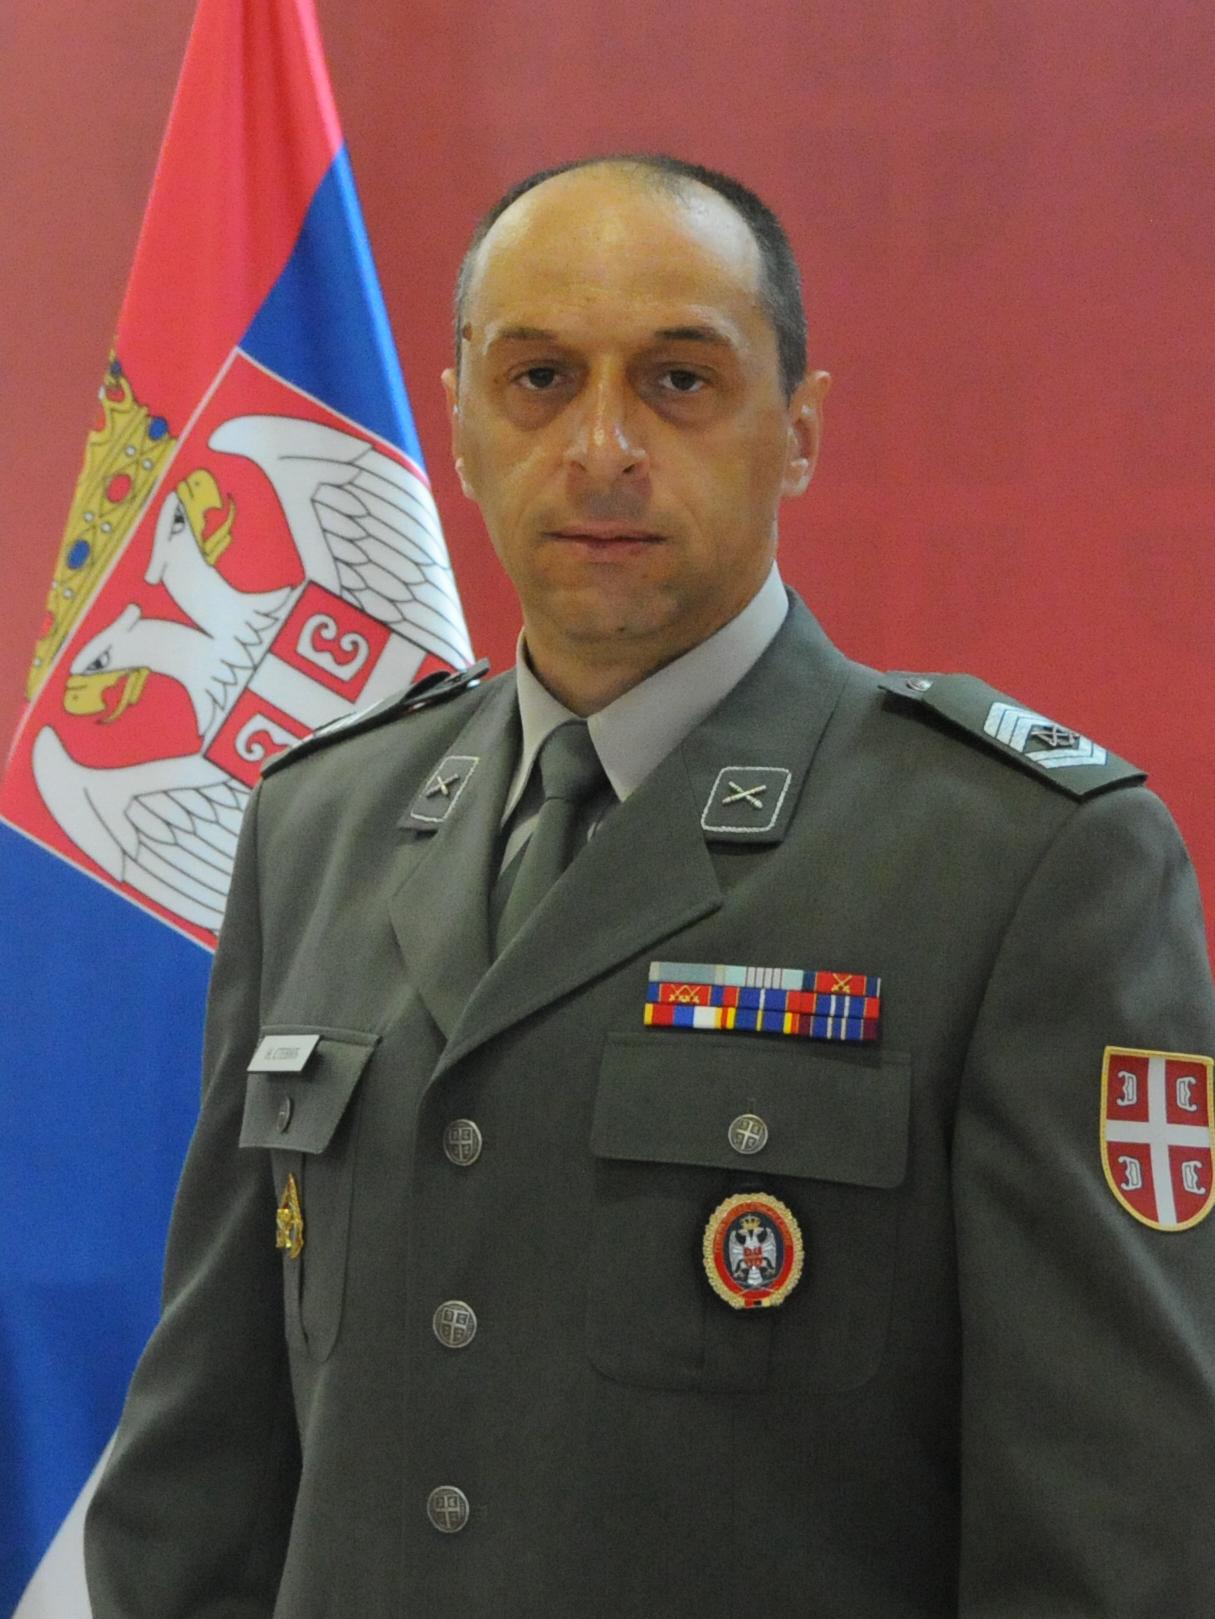 Sergeant Major Zoran Kocić